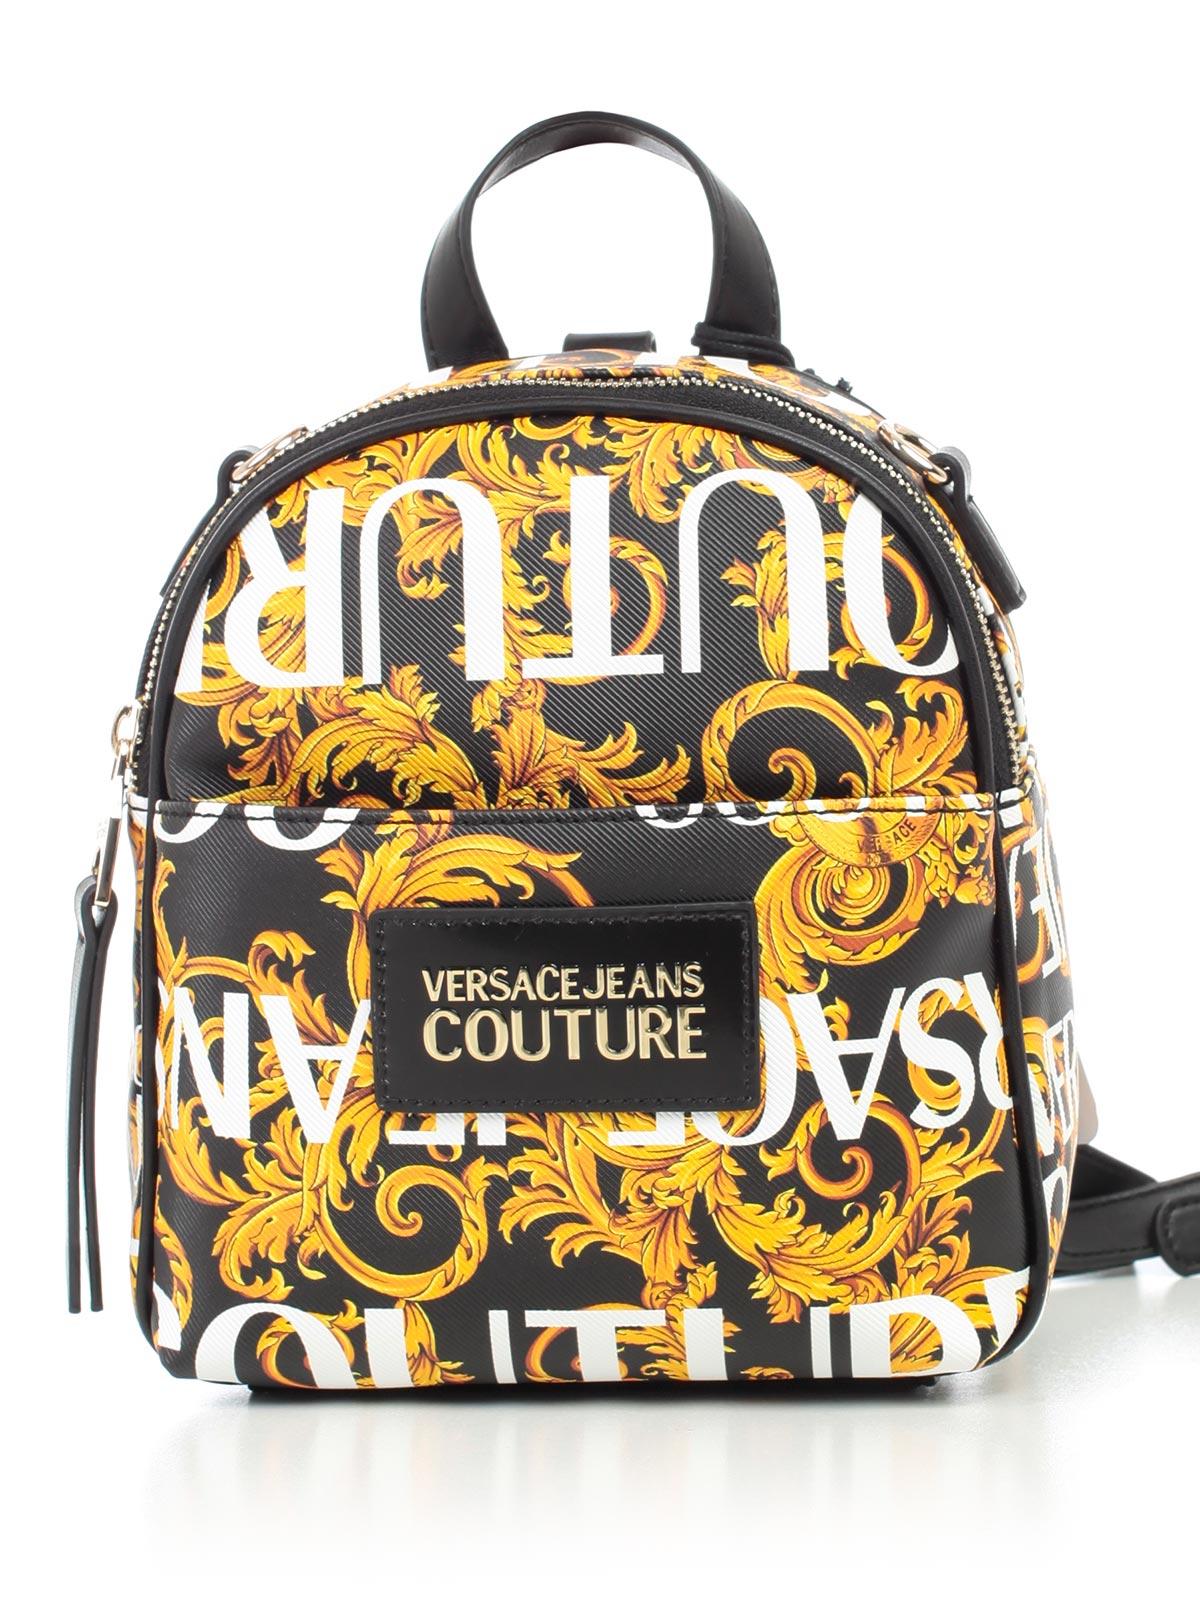 c765e87e92b46 Versace Jeans Couture Bags